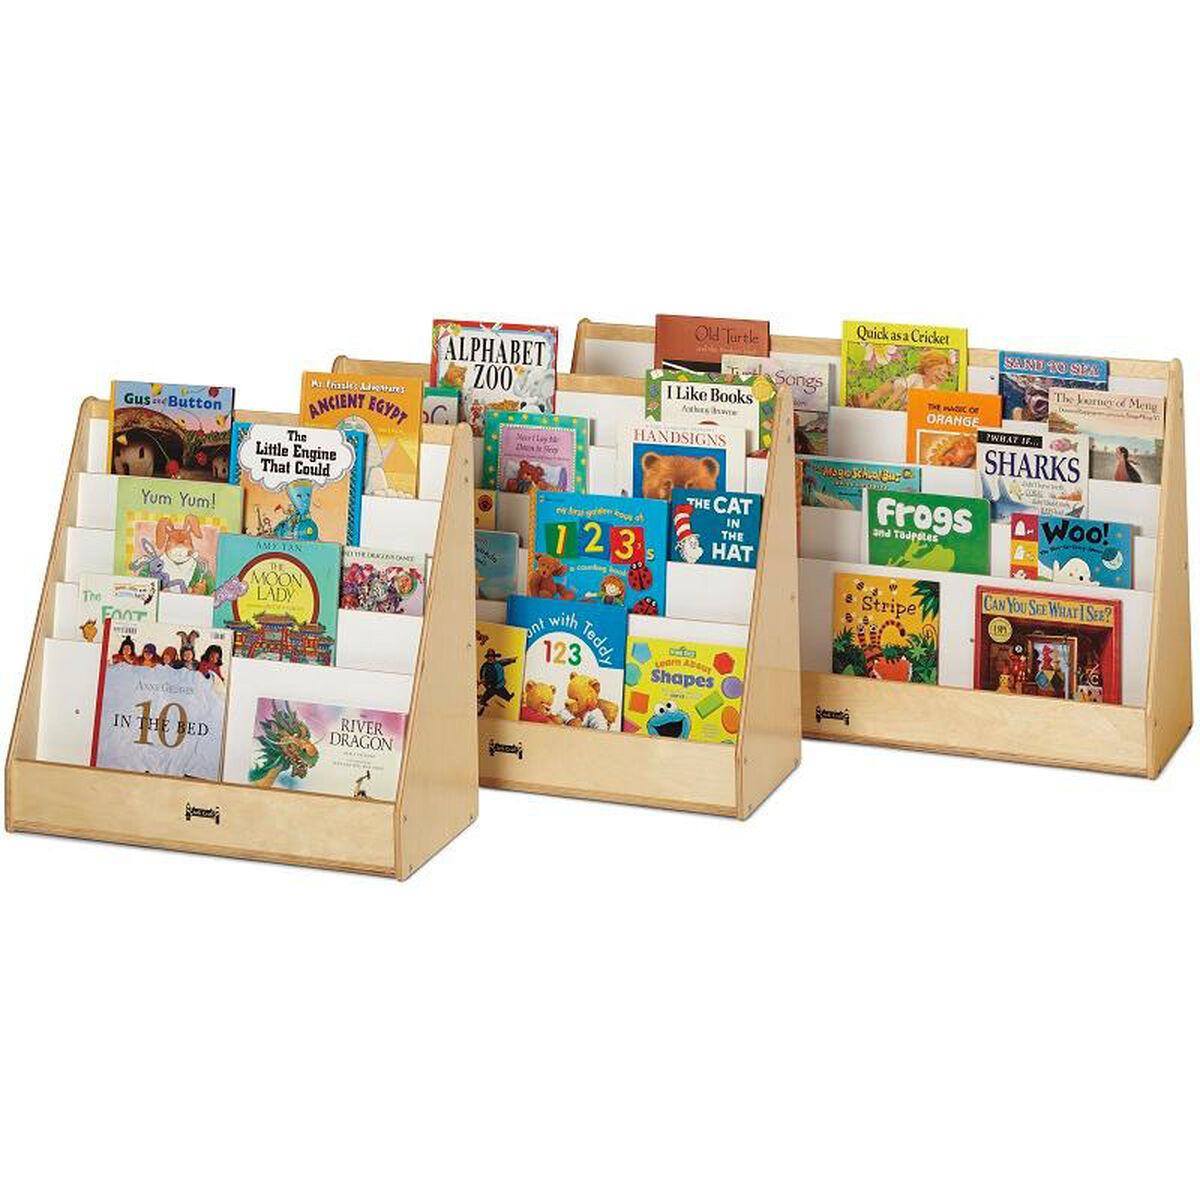 Flushback Pick A Book Stand 3459jc Bizchaircom - Can-pick-the-book-quick